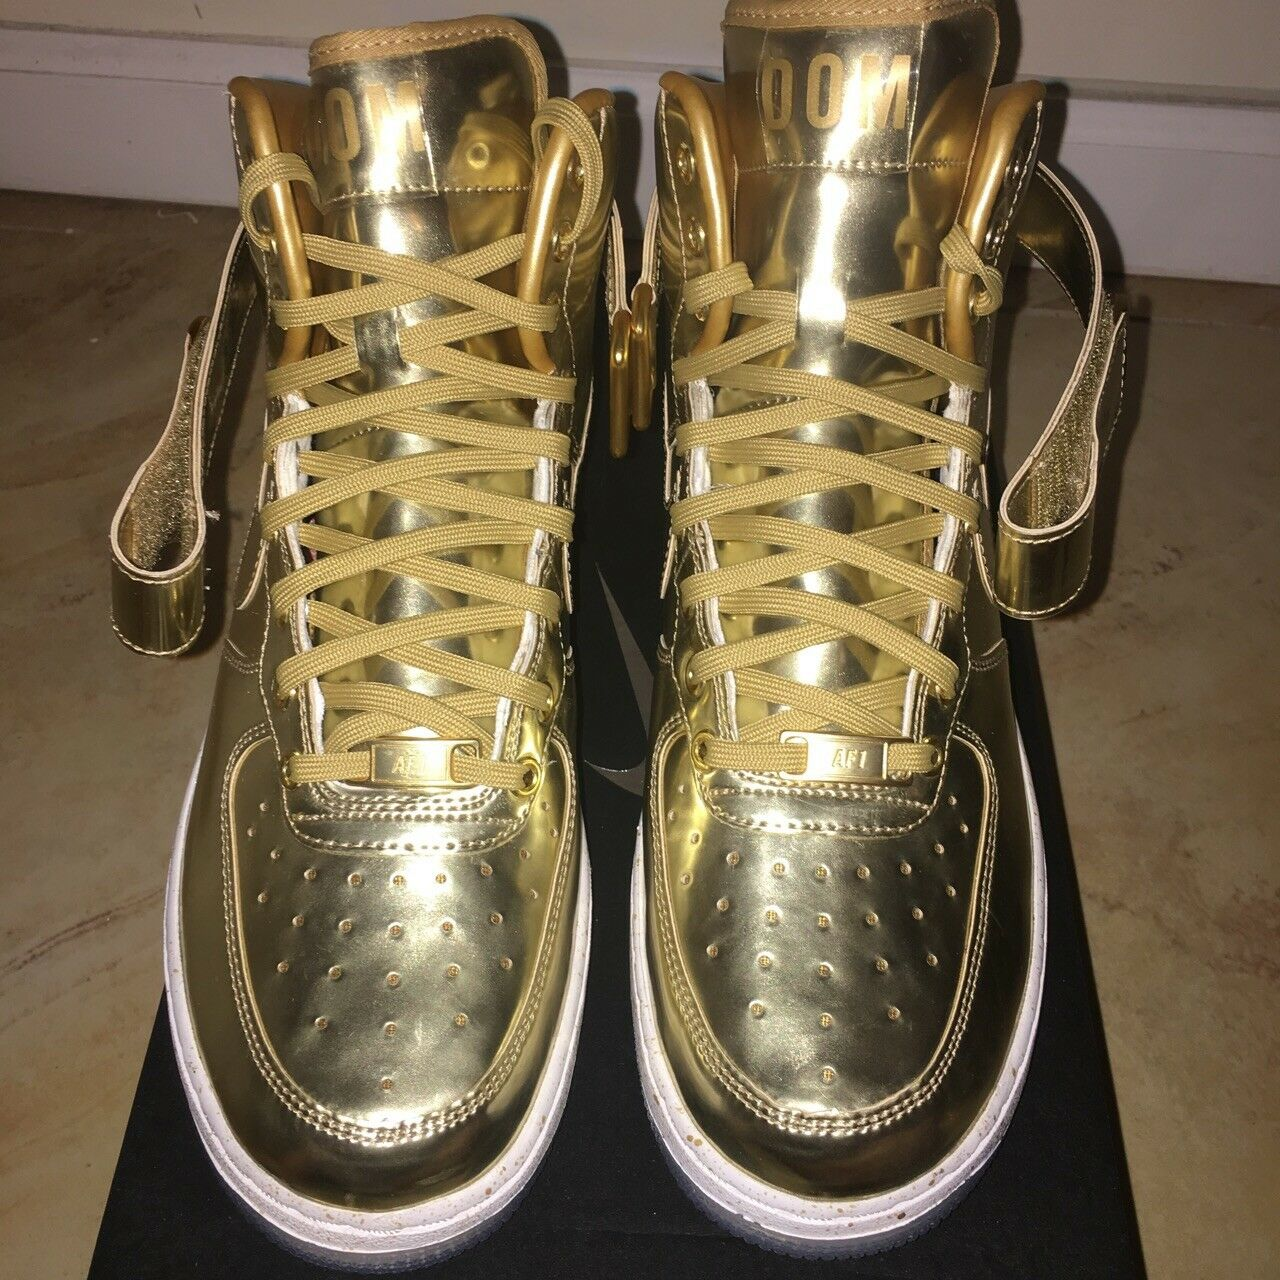 Nike ID AF1 Air Force 1 Liquid Gold Transparent Gum Sole